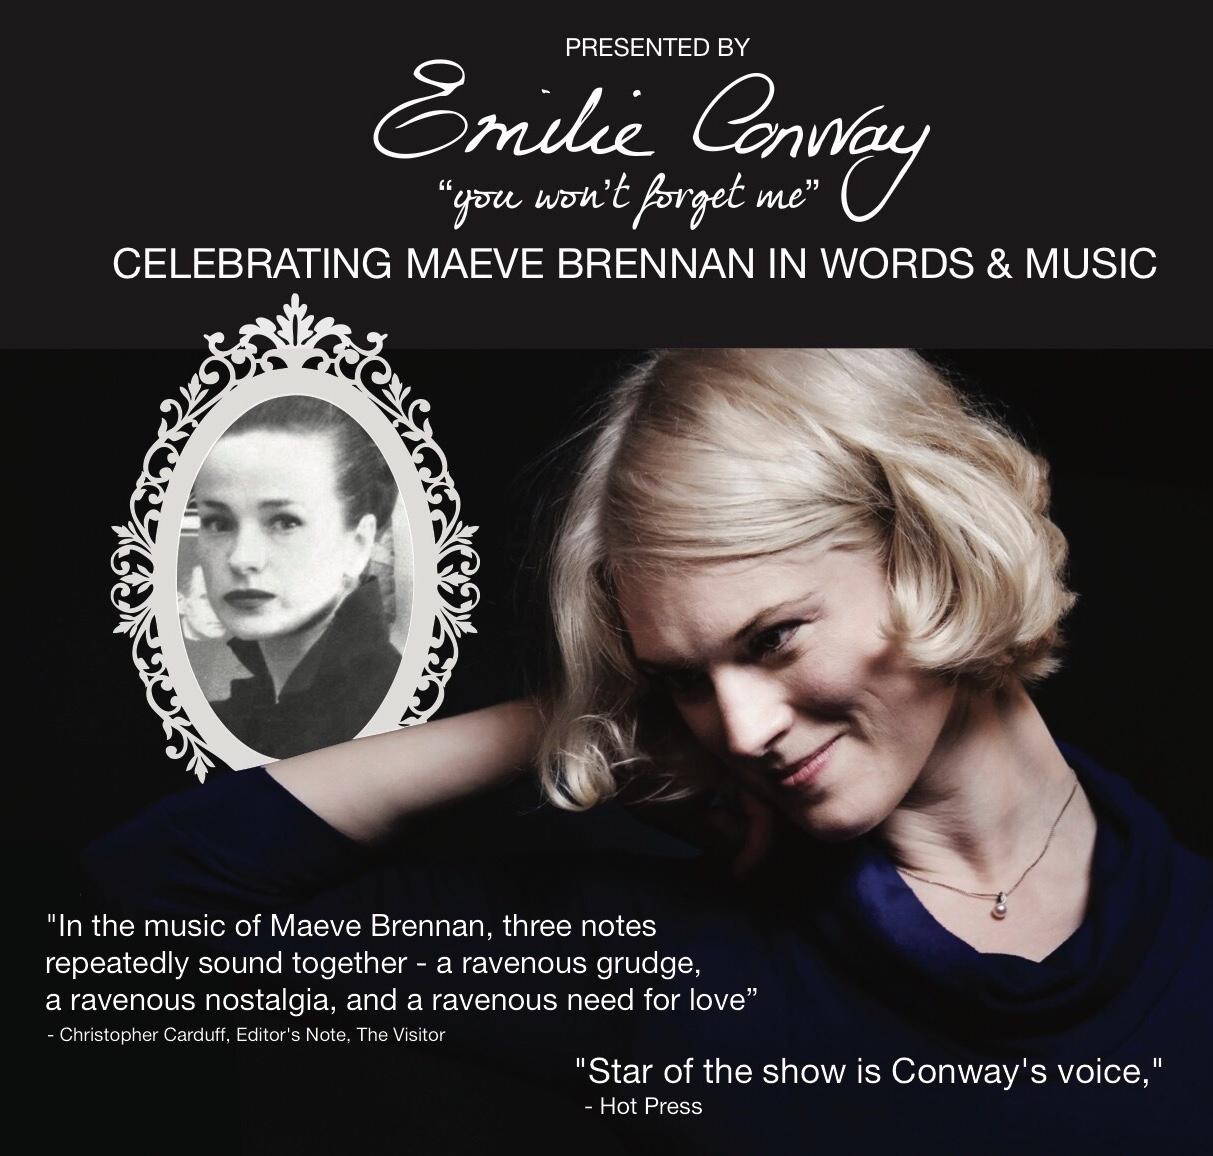 You Won't Forget Me: Celebrating Maeve Brennan